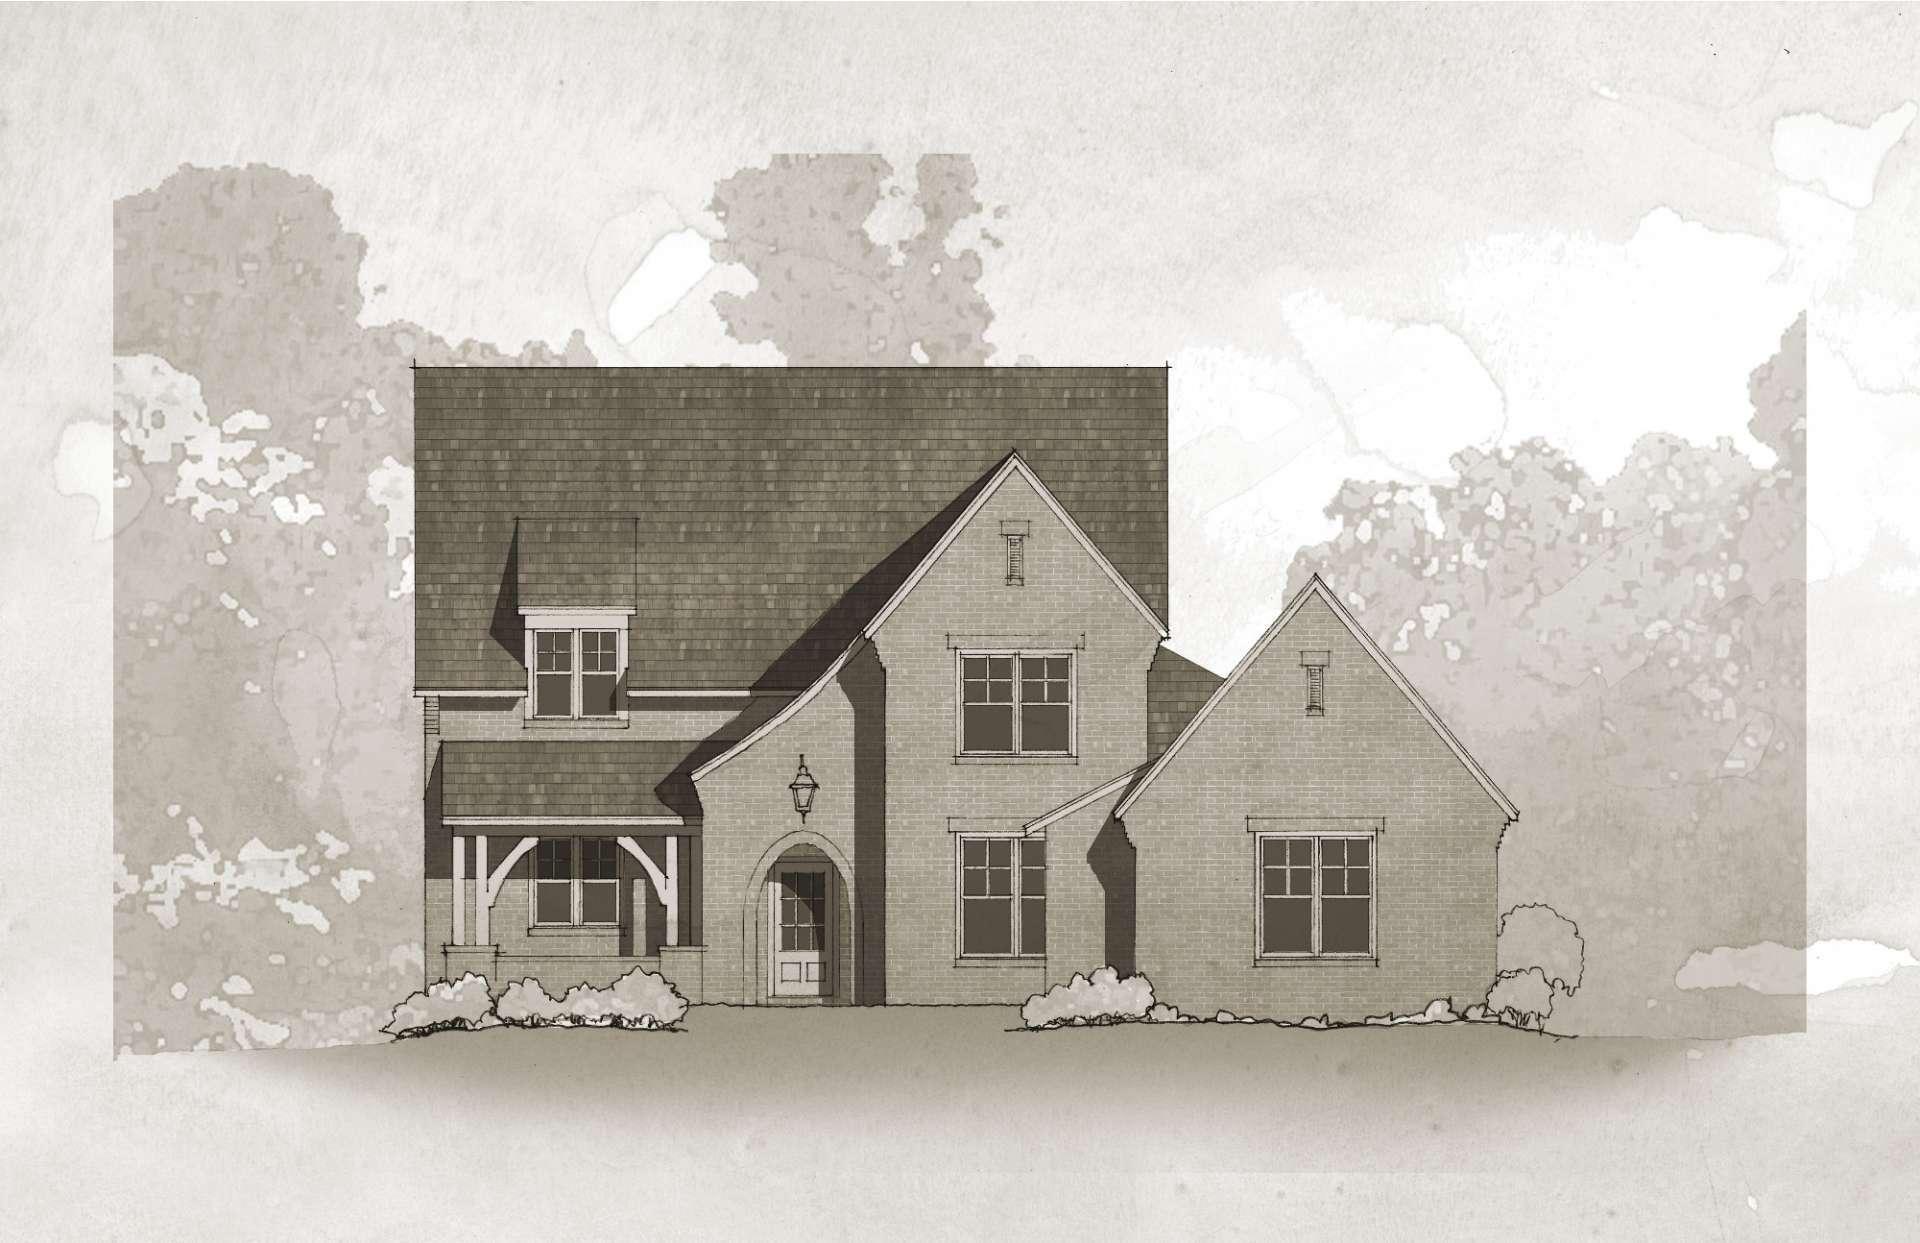 Real Estate at Steelemont, Birmingham in Jefferson County, AL 35243